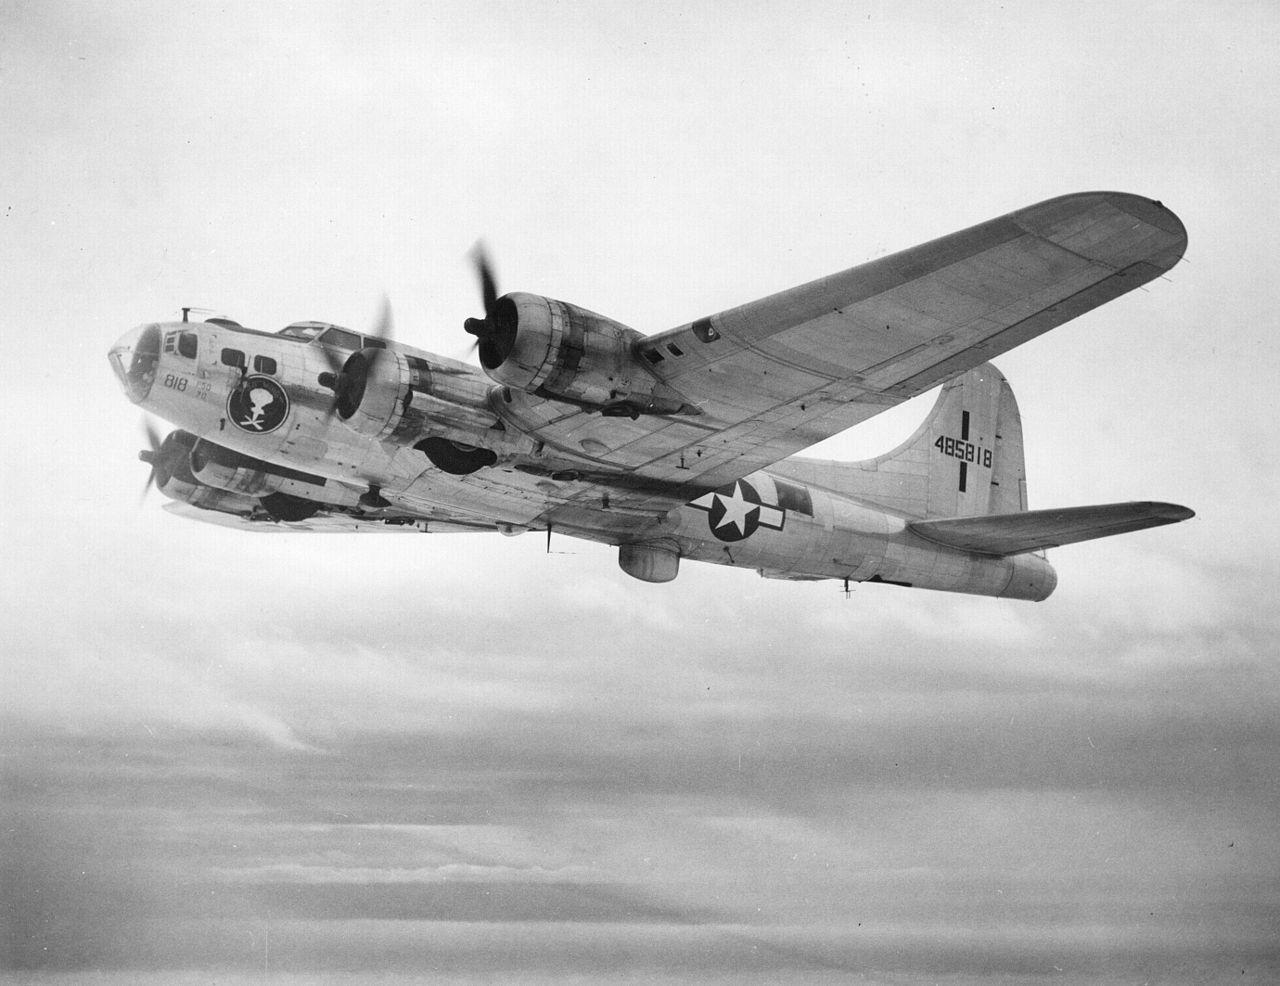 B-17 #44-85818